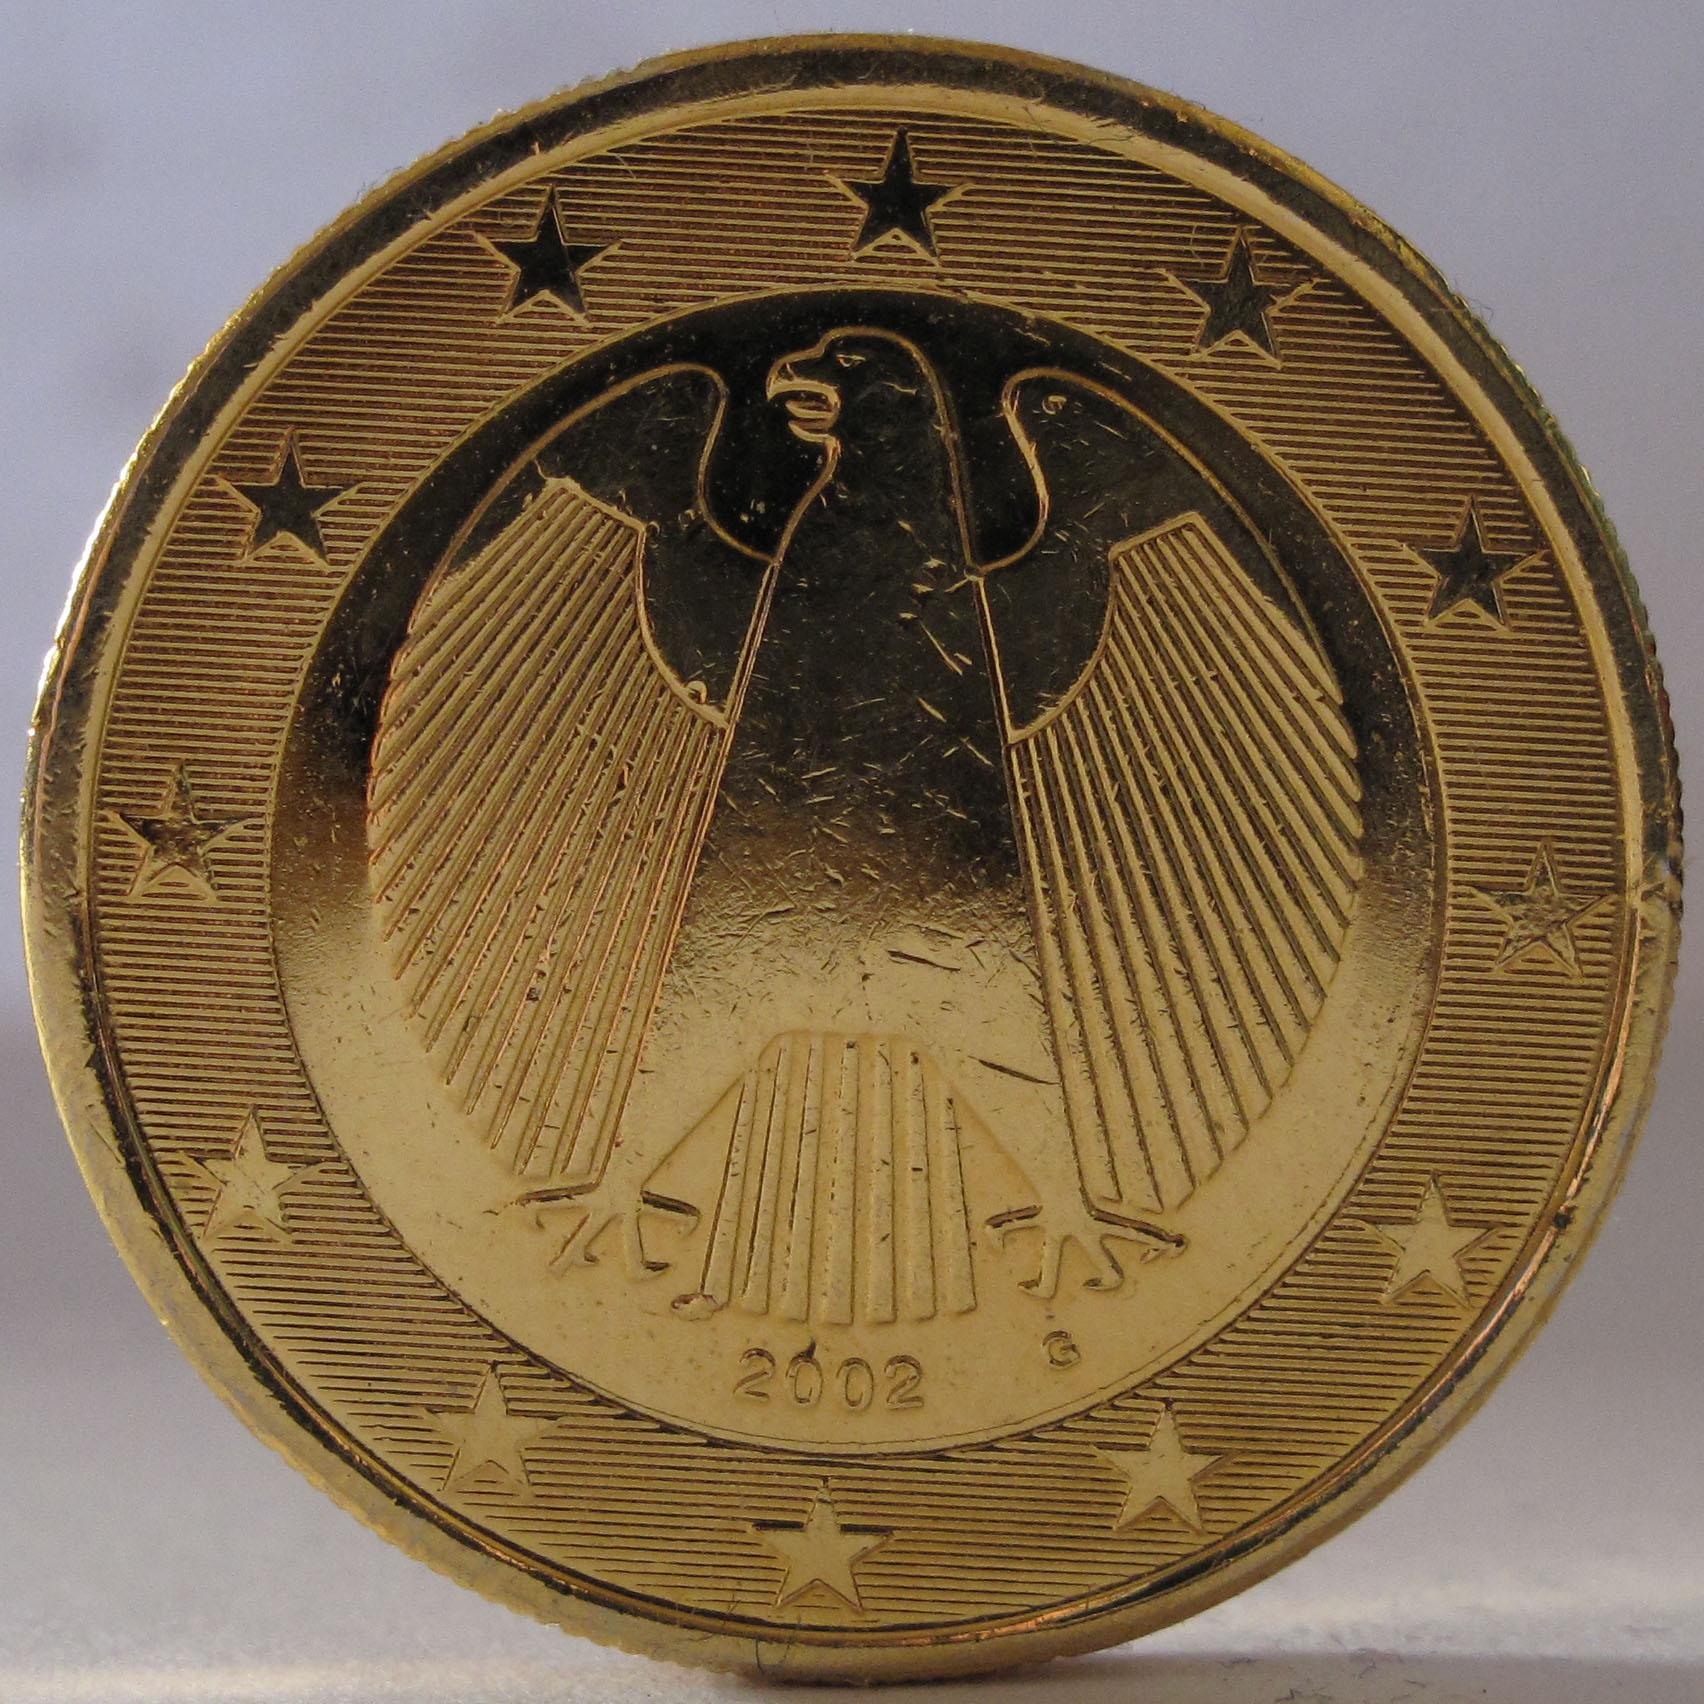 1 Euro Münze Gold